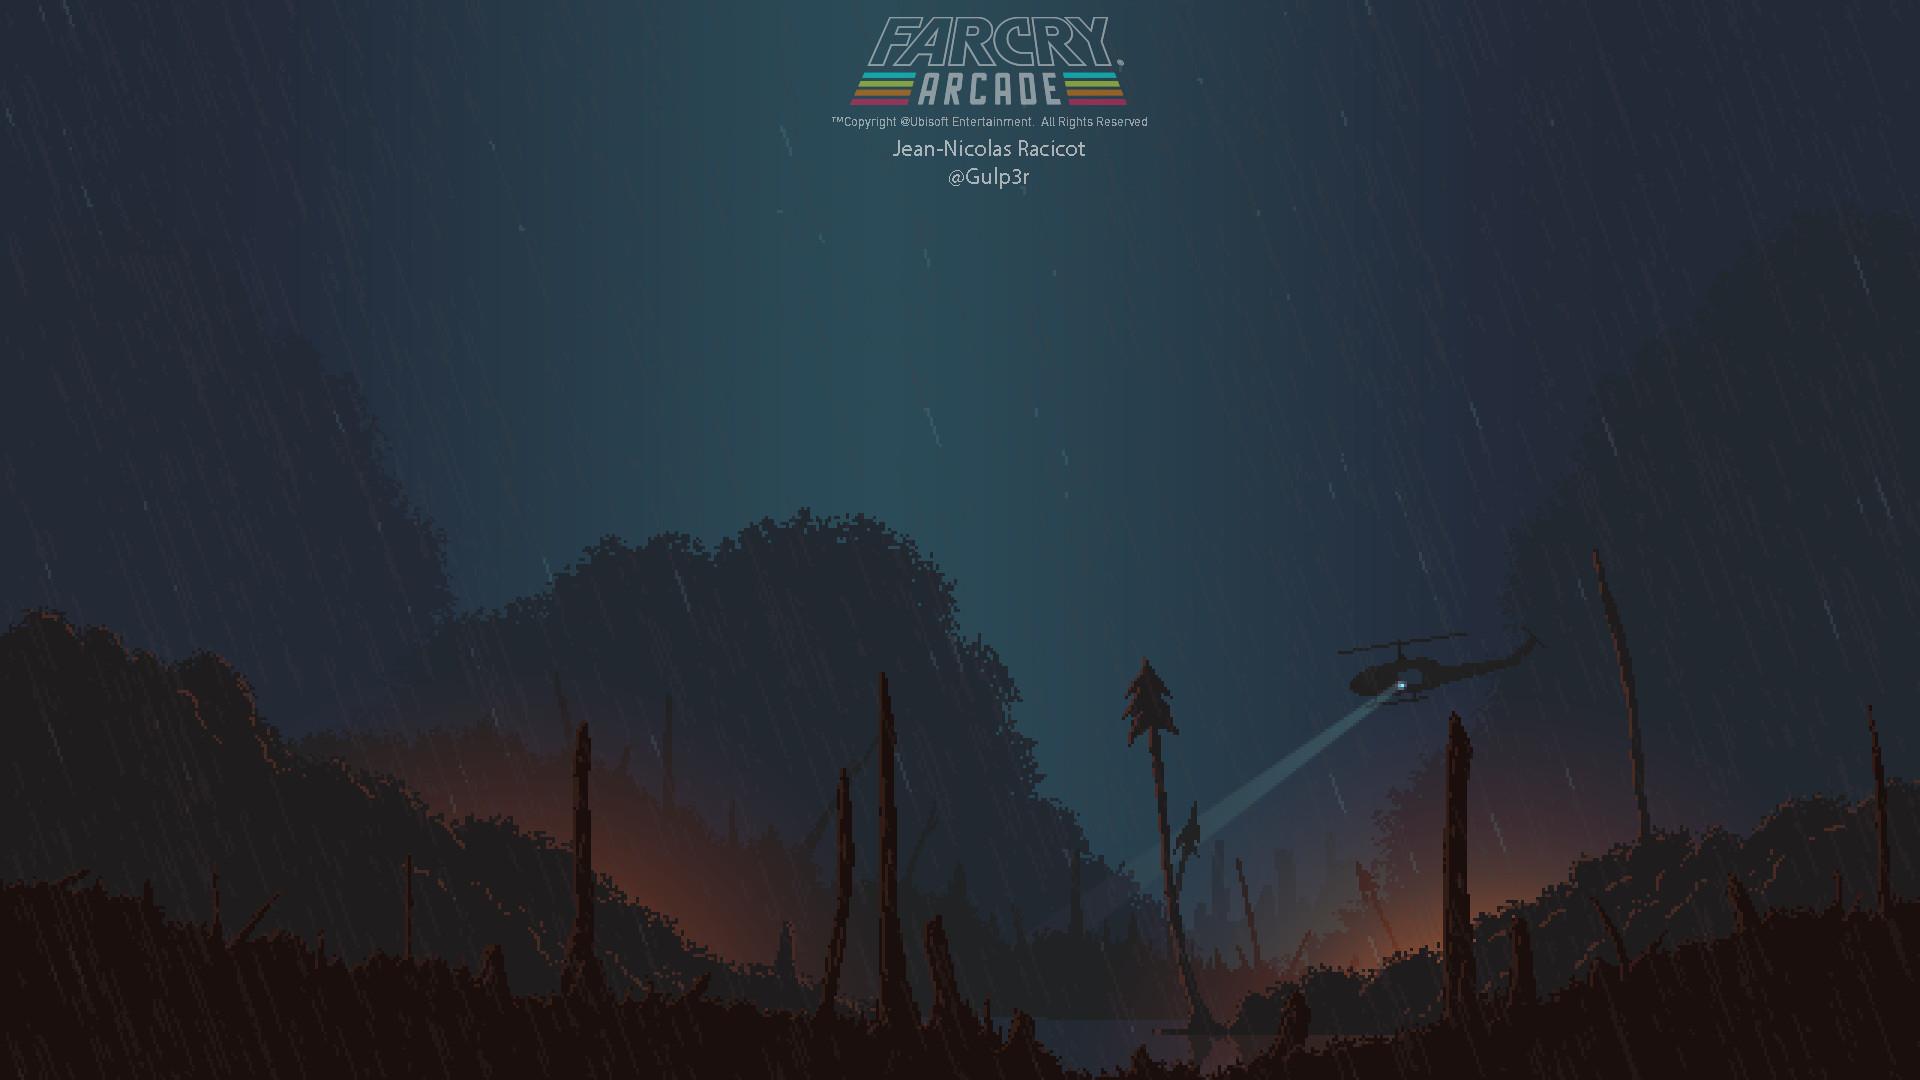 Artstation Farcry Arcade Pixelart Background Vietnam Jean Nicolas Racicot